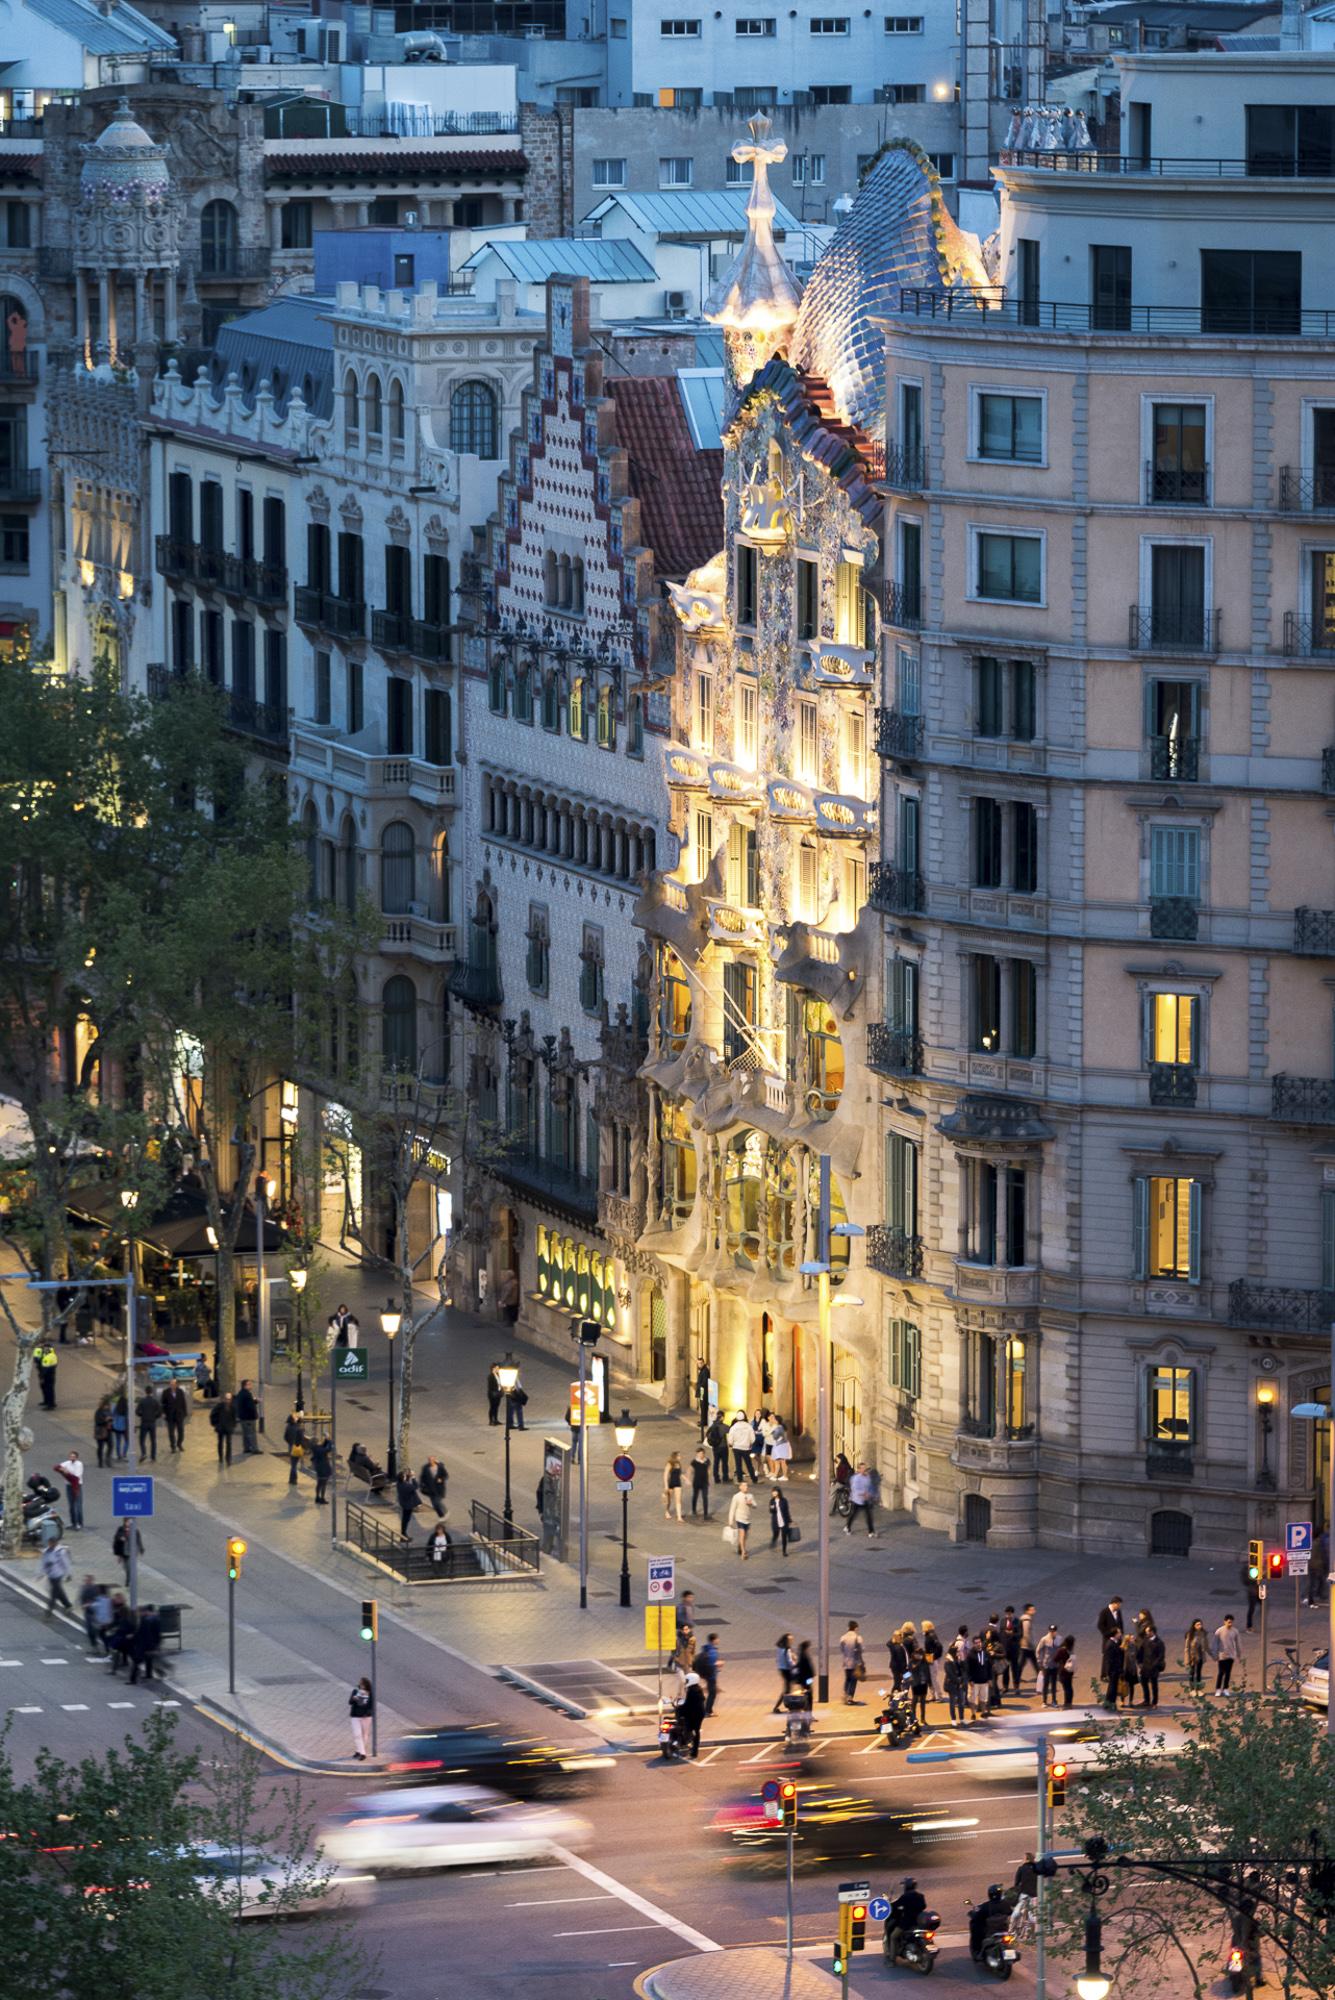 Barcelona-Gauvin-008-aperture-tours.jpg